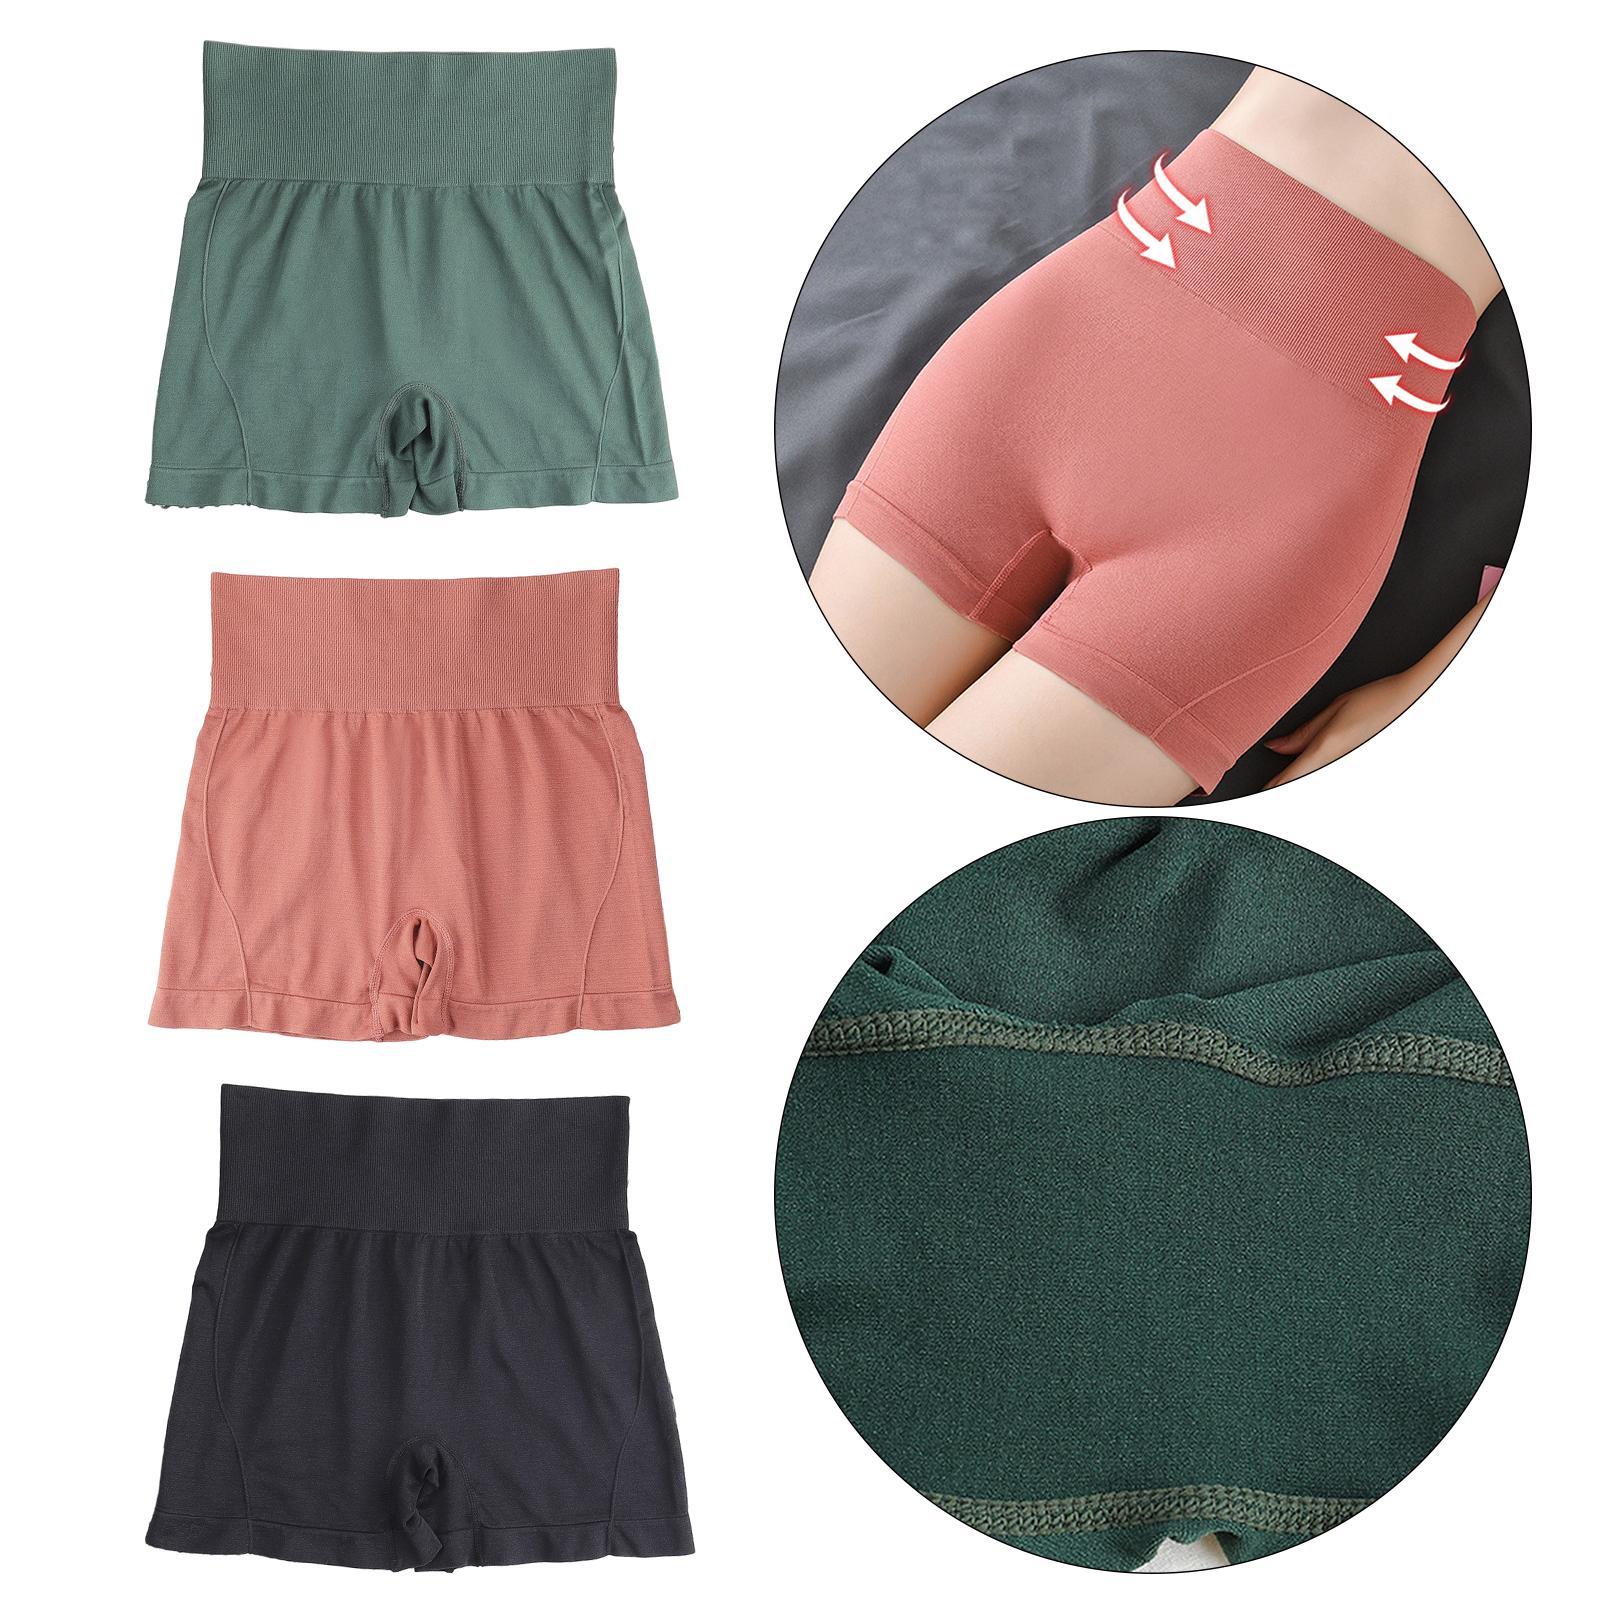 Dehnbare weiche Frauen Yoga Shorts Hip Biker Hot Pants Strumpfhosen Mini